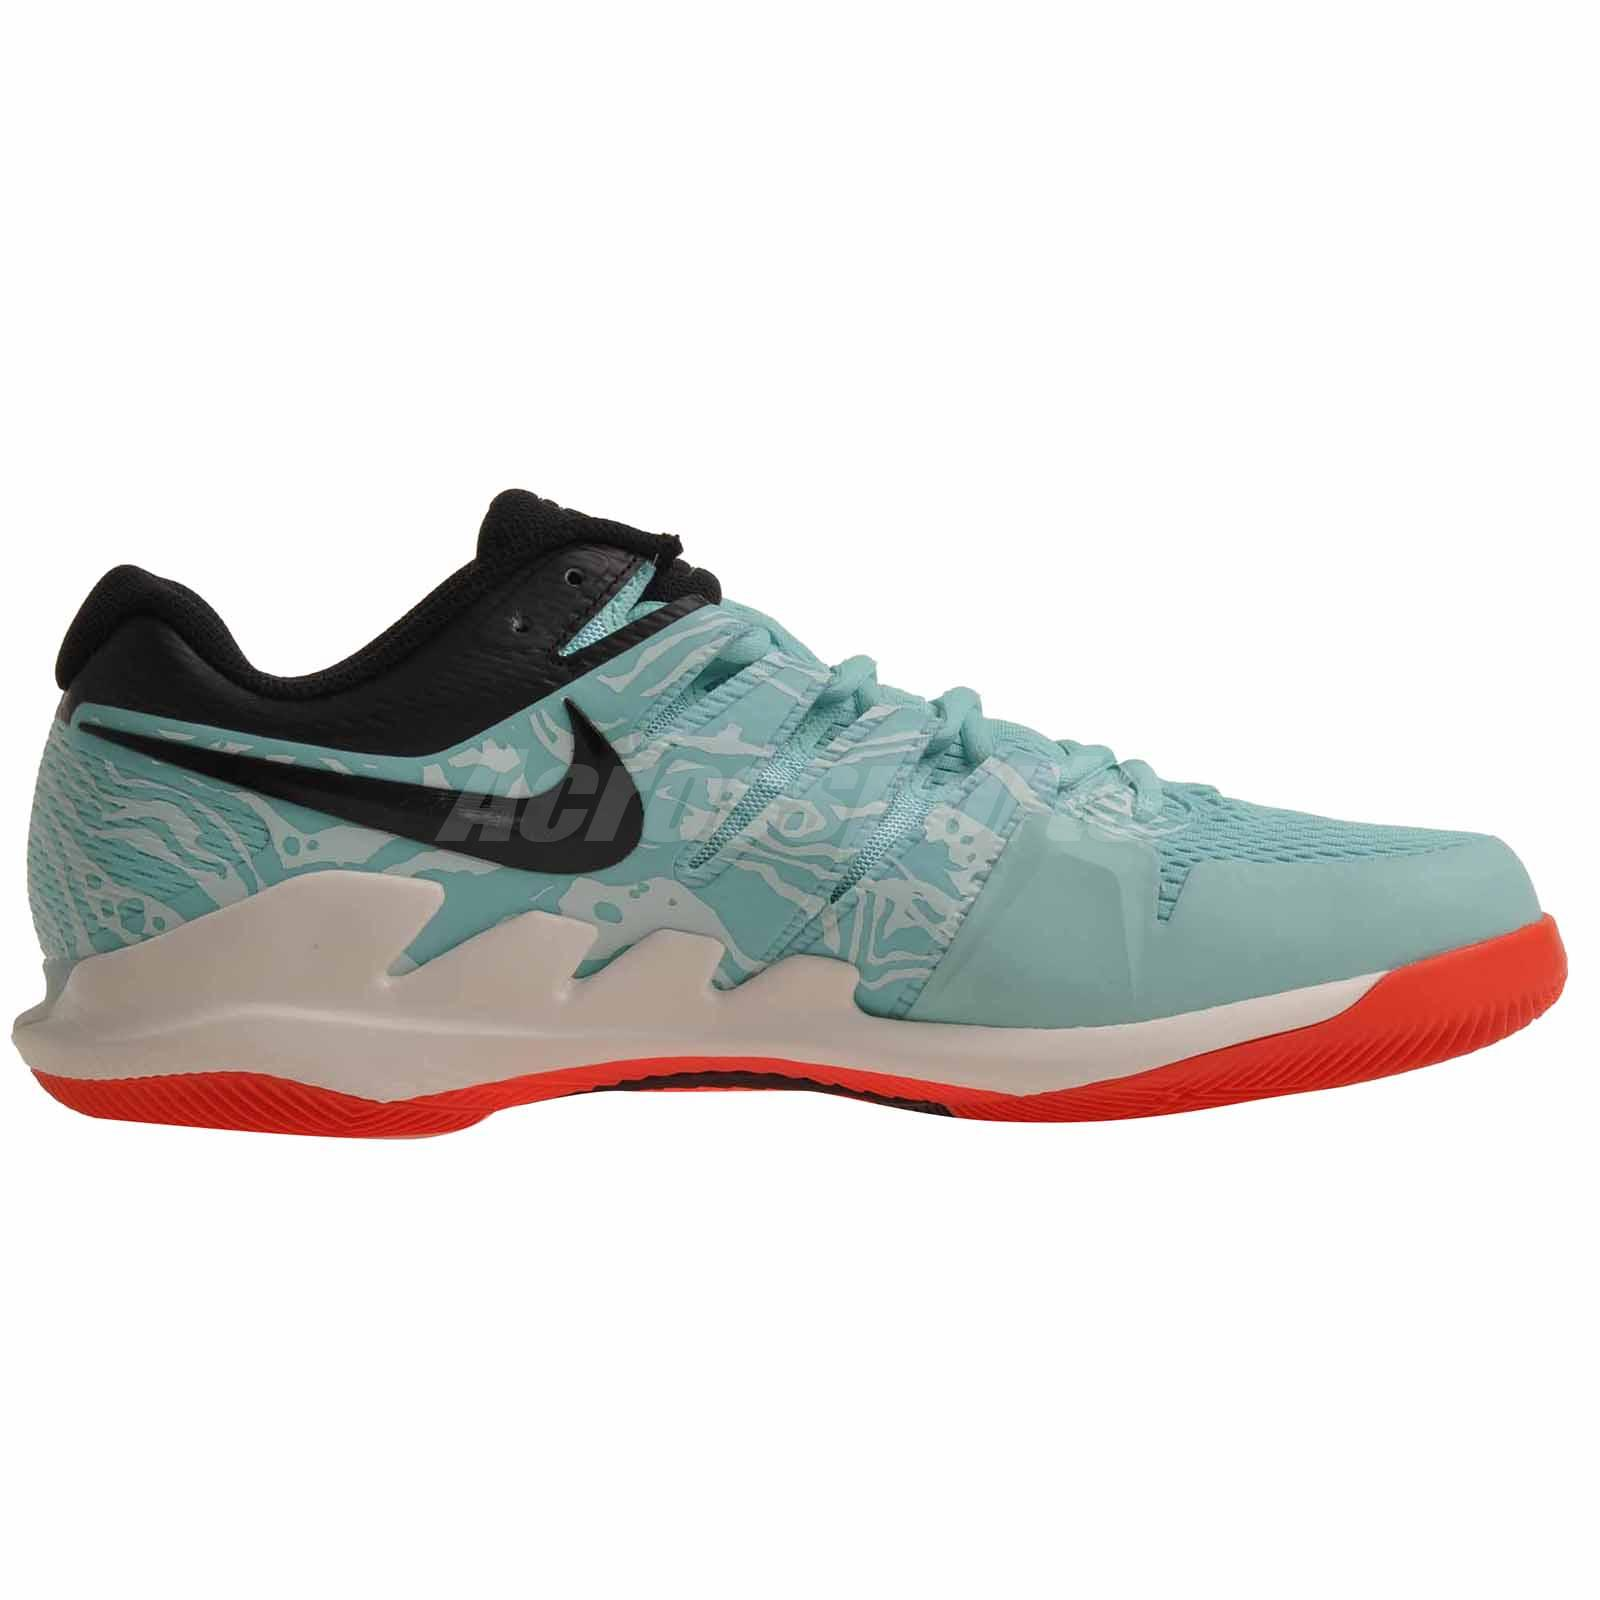 hot sales on feet shots of performance sportswear Nike Air Zoom Vapor X Clay Uk10/eur45 Tennis Shoes AA8021 ...